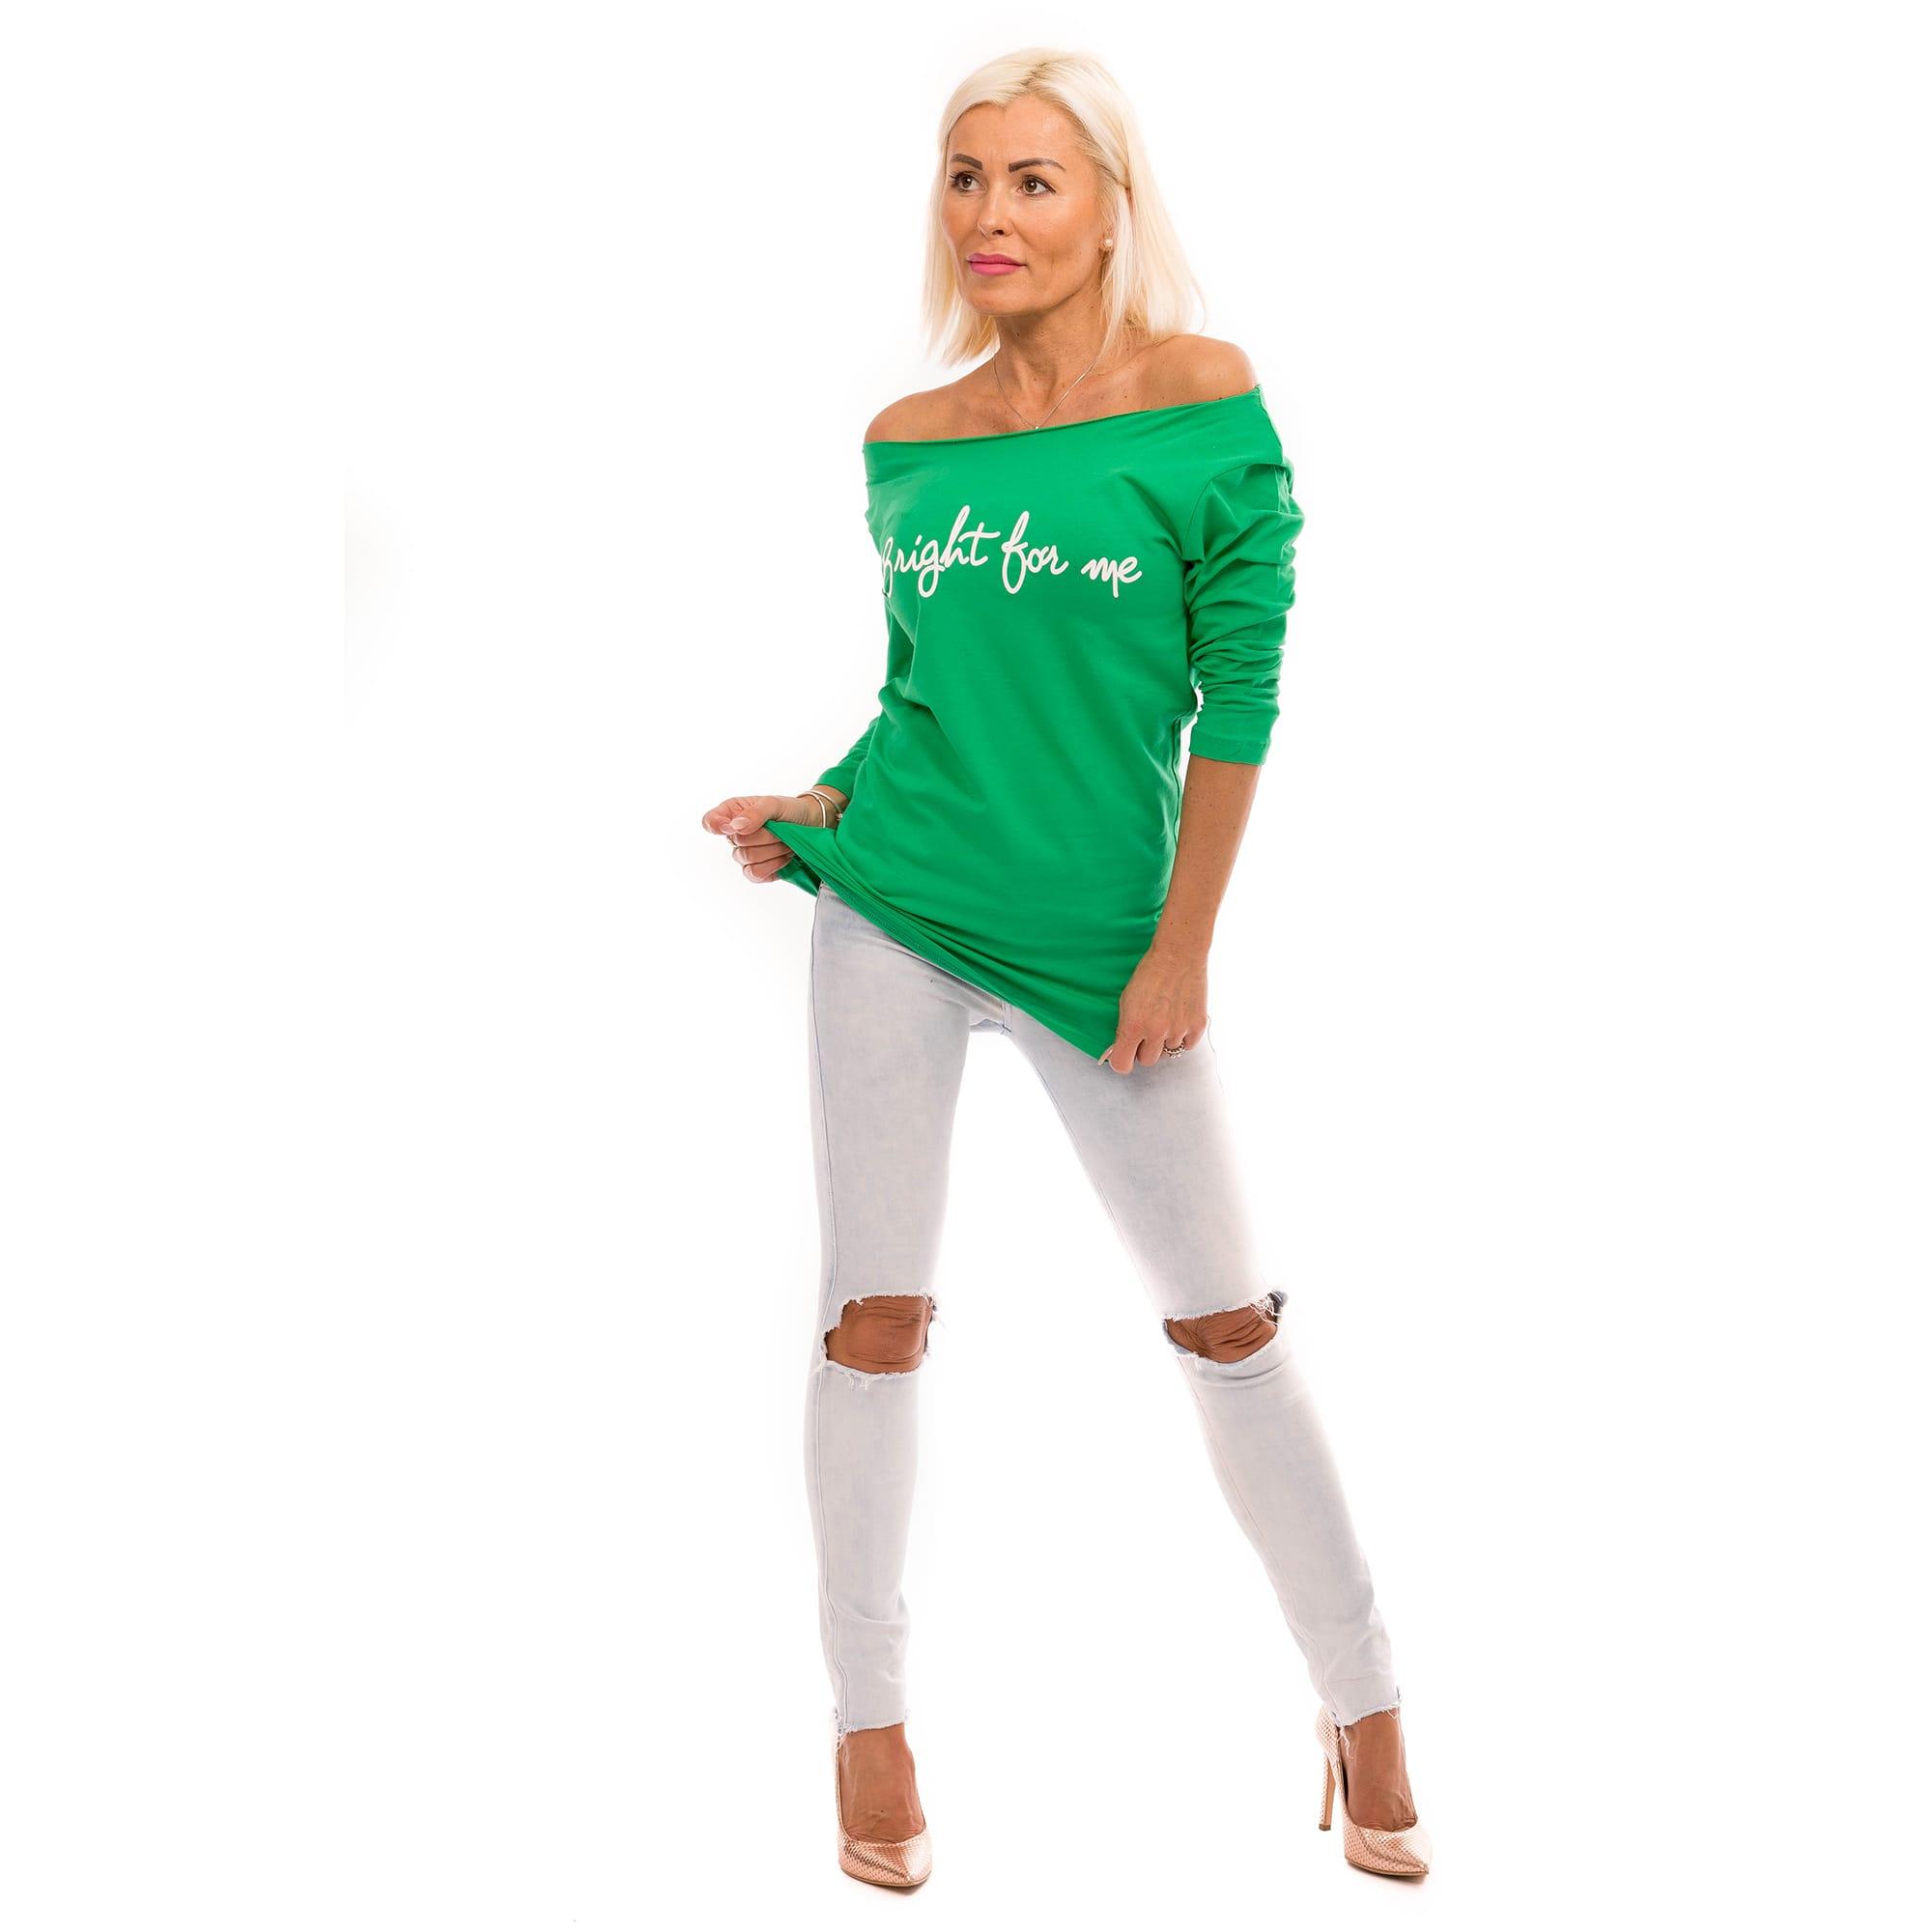 100687a9276a Dámska móda a doplnky - Dámska ležérna blúzka Bright for me - zelená ...